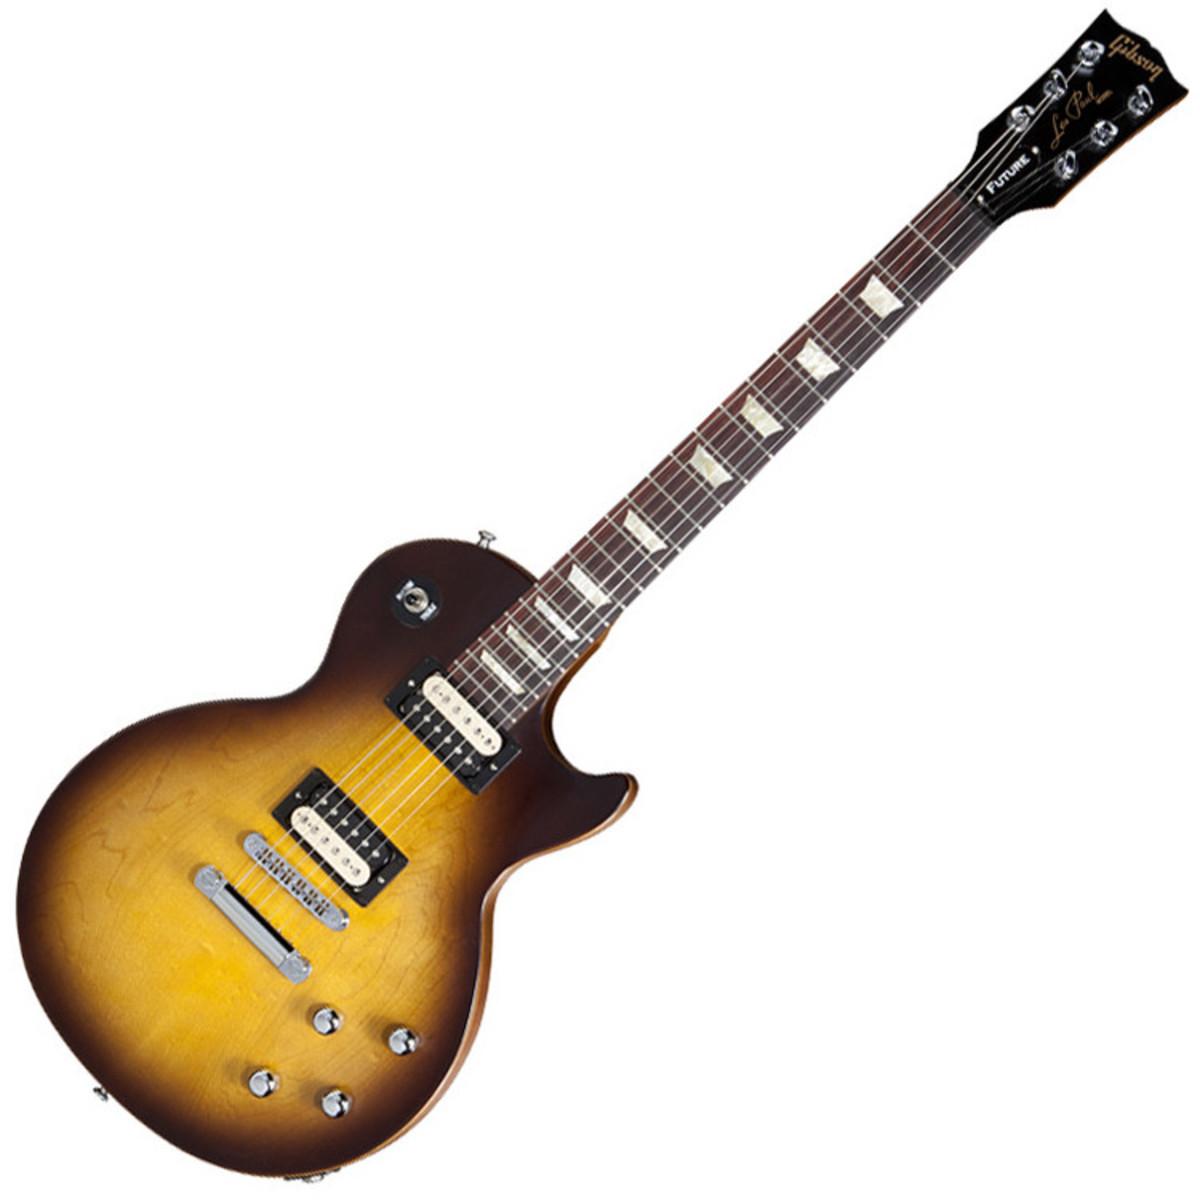 disc gibson les paul future tribute electric guitar vintage sunburst at gear4music. Black Bedroom Furniture Sets. Home Design Ideas